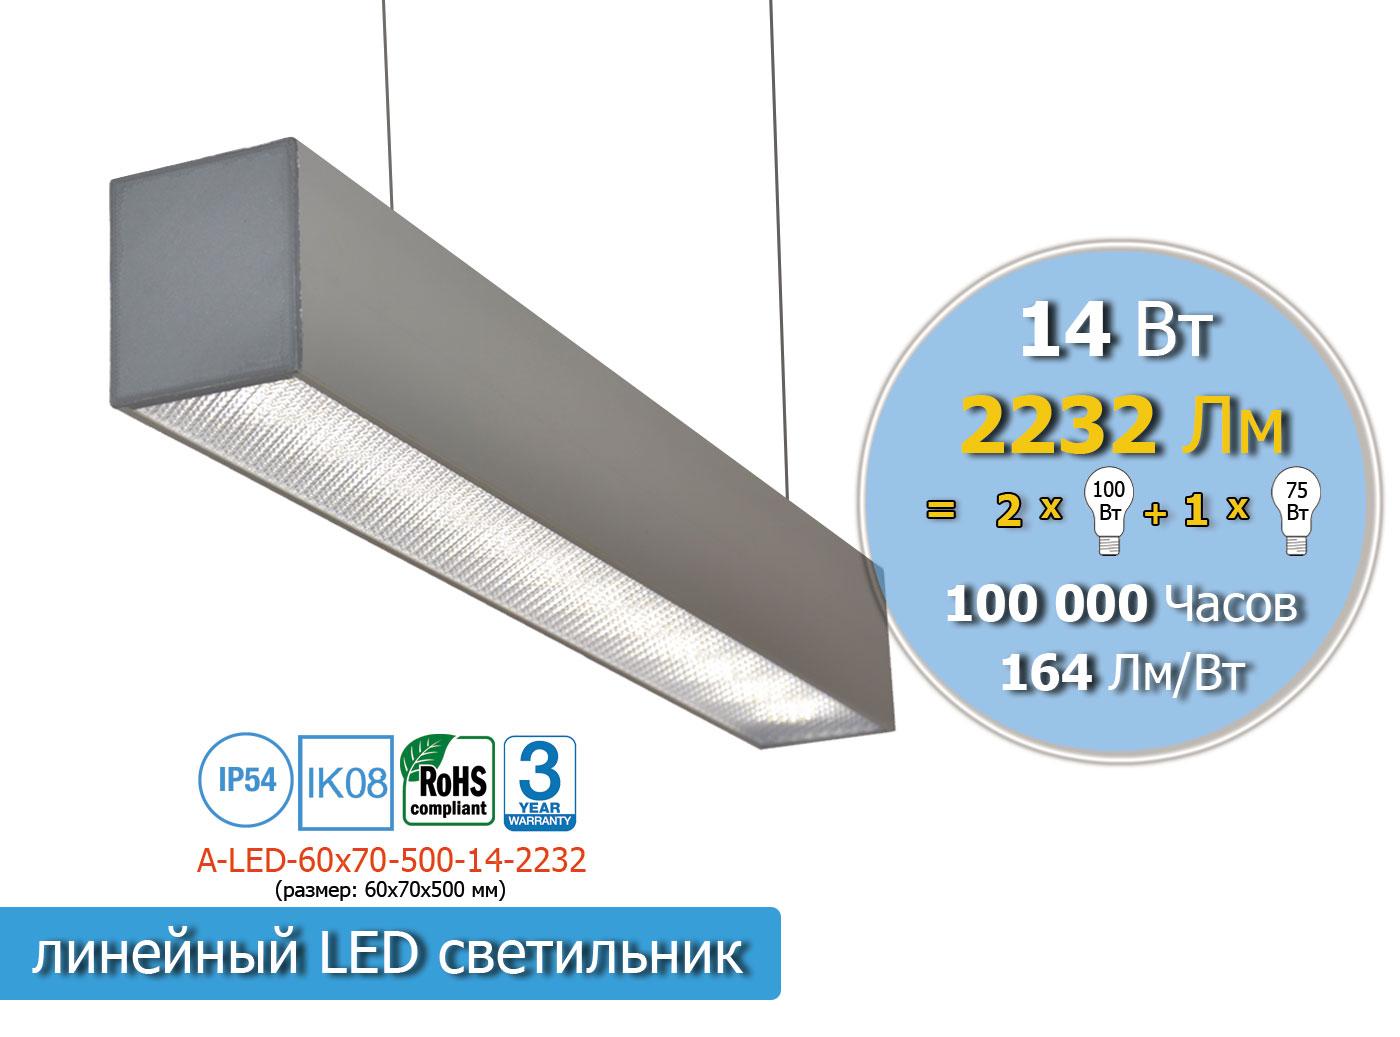 A-LED-60х70-500-14-2232